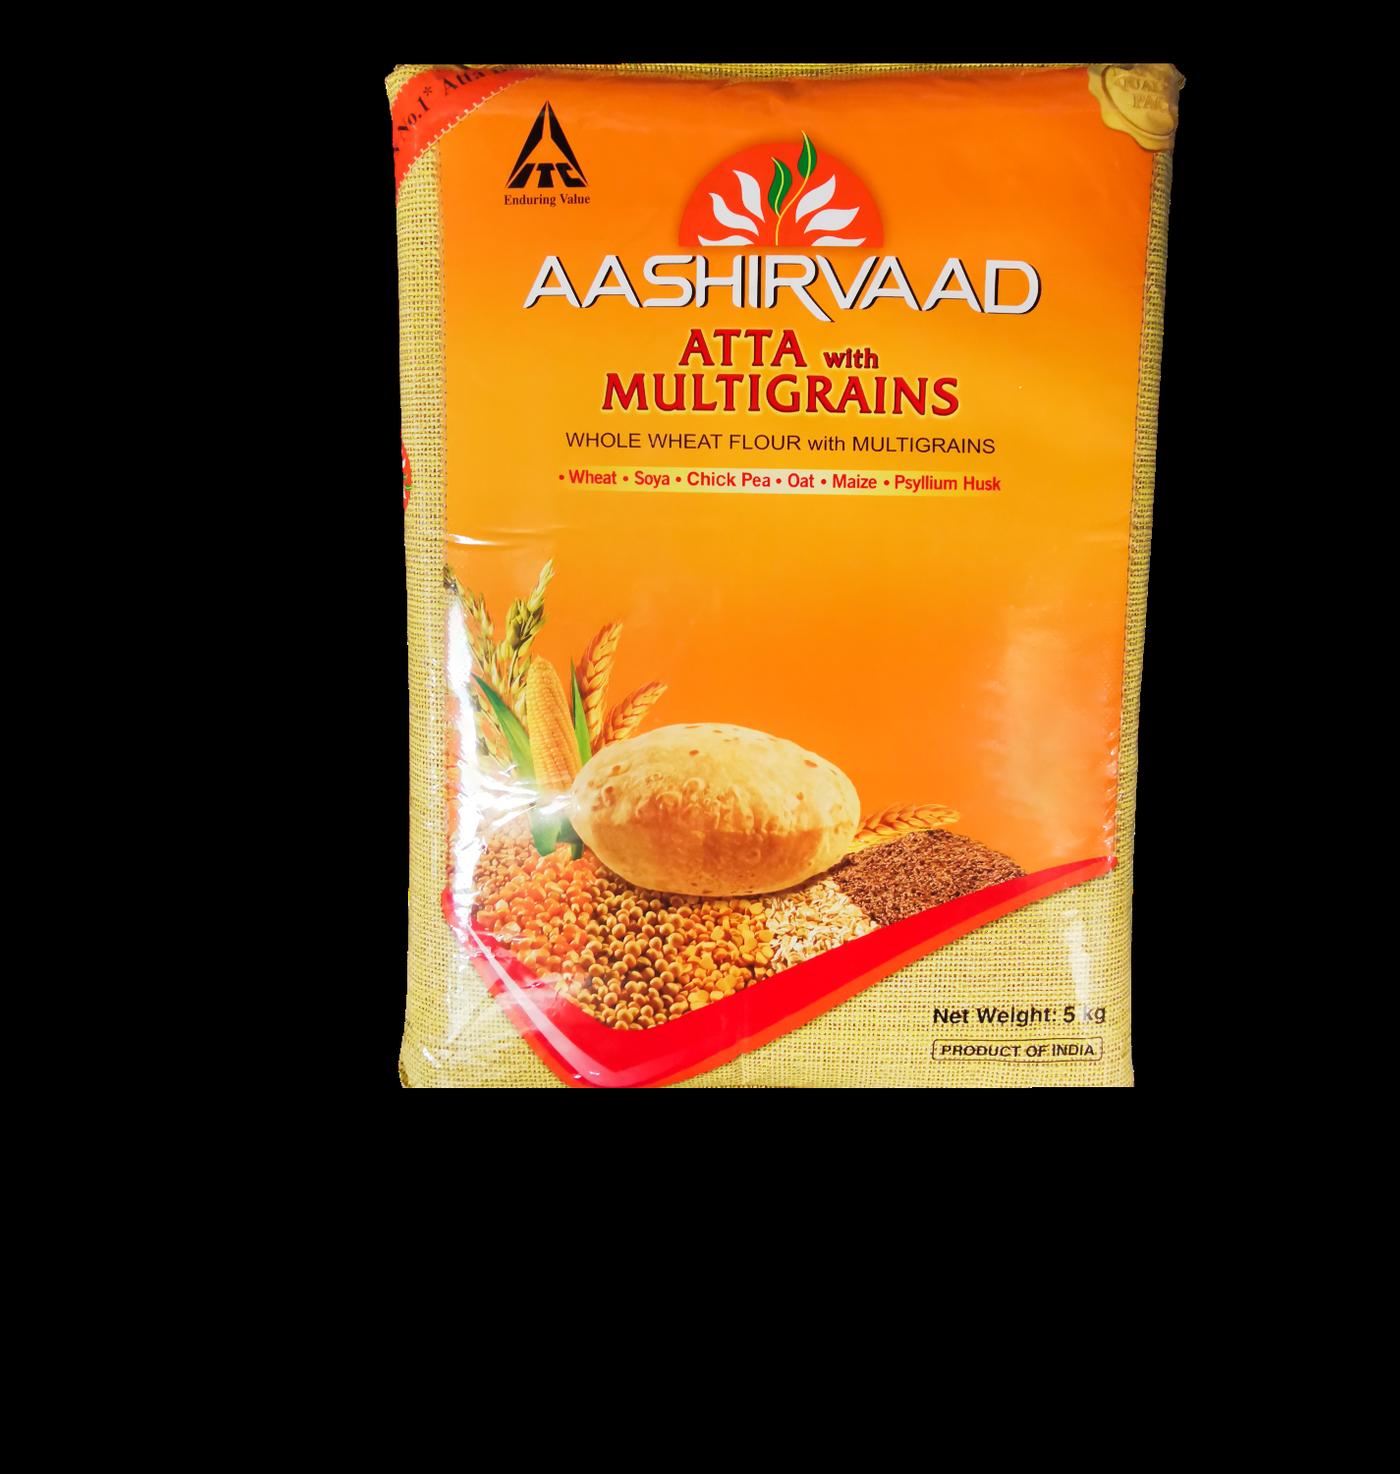 Aashirvaad Atta with Multigrain